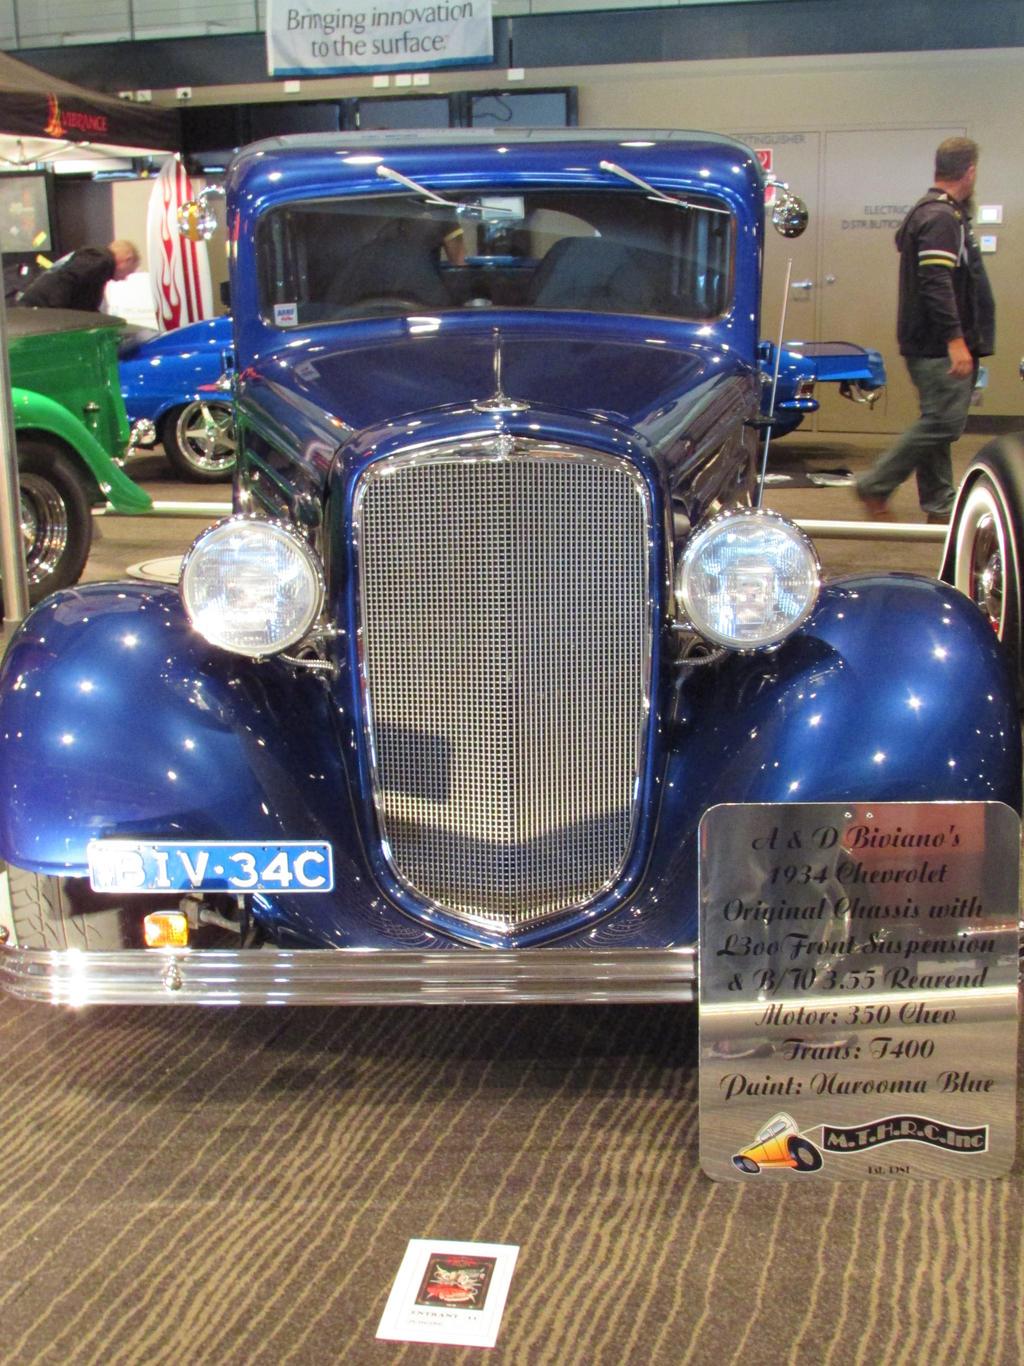 Sydney Hot Rod and Custom Car Show 8 by Nitrofires-Revenge